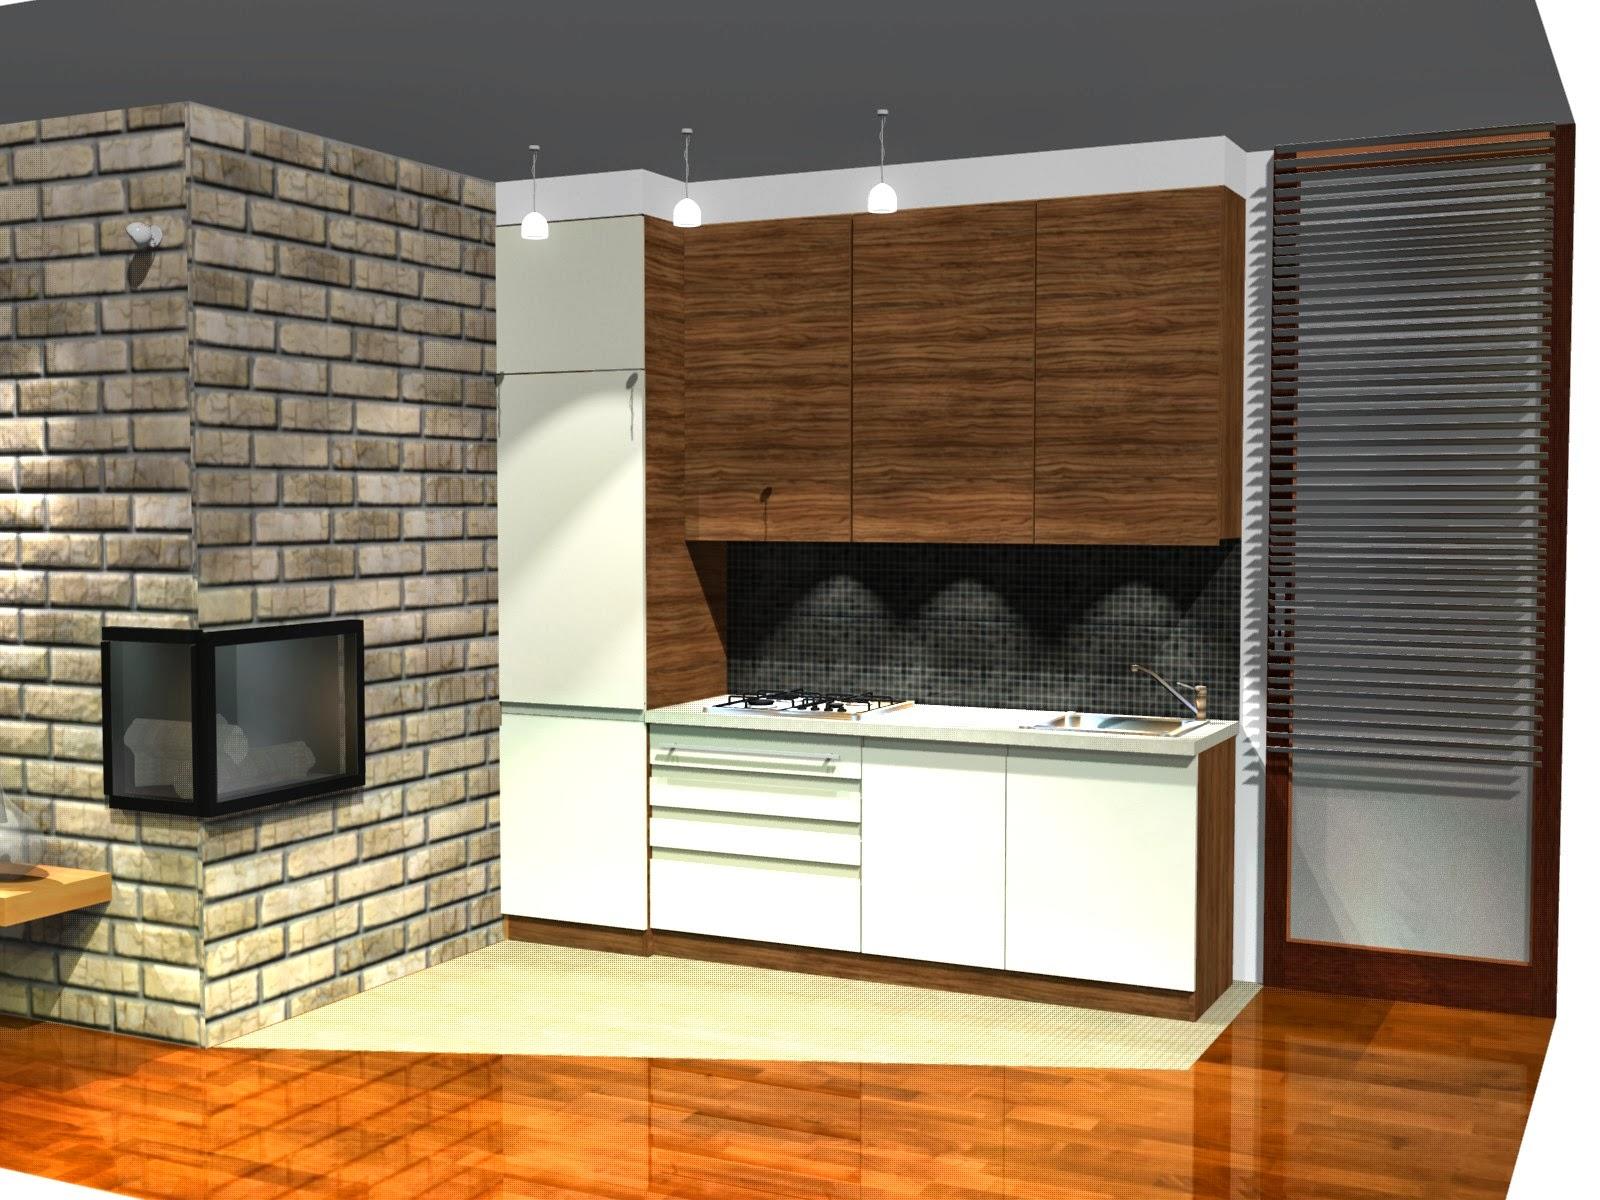 Projekty Kuchni Blog O Projektowaniu Mebli